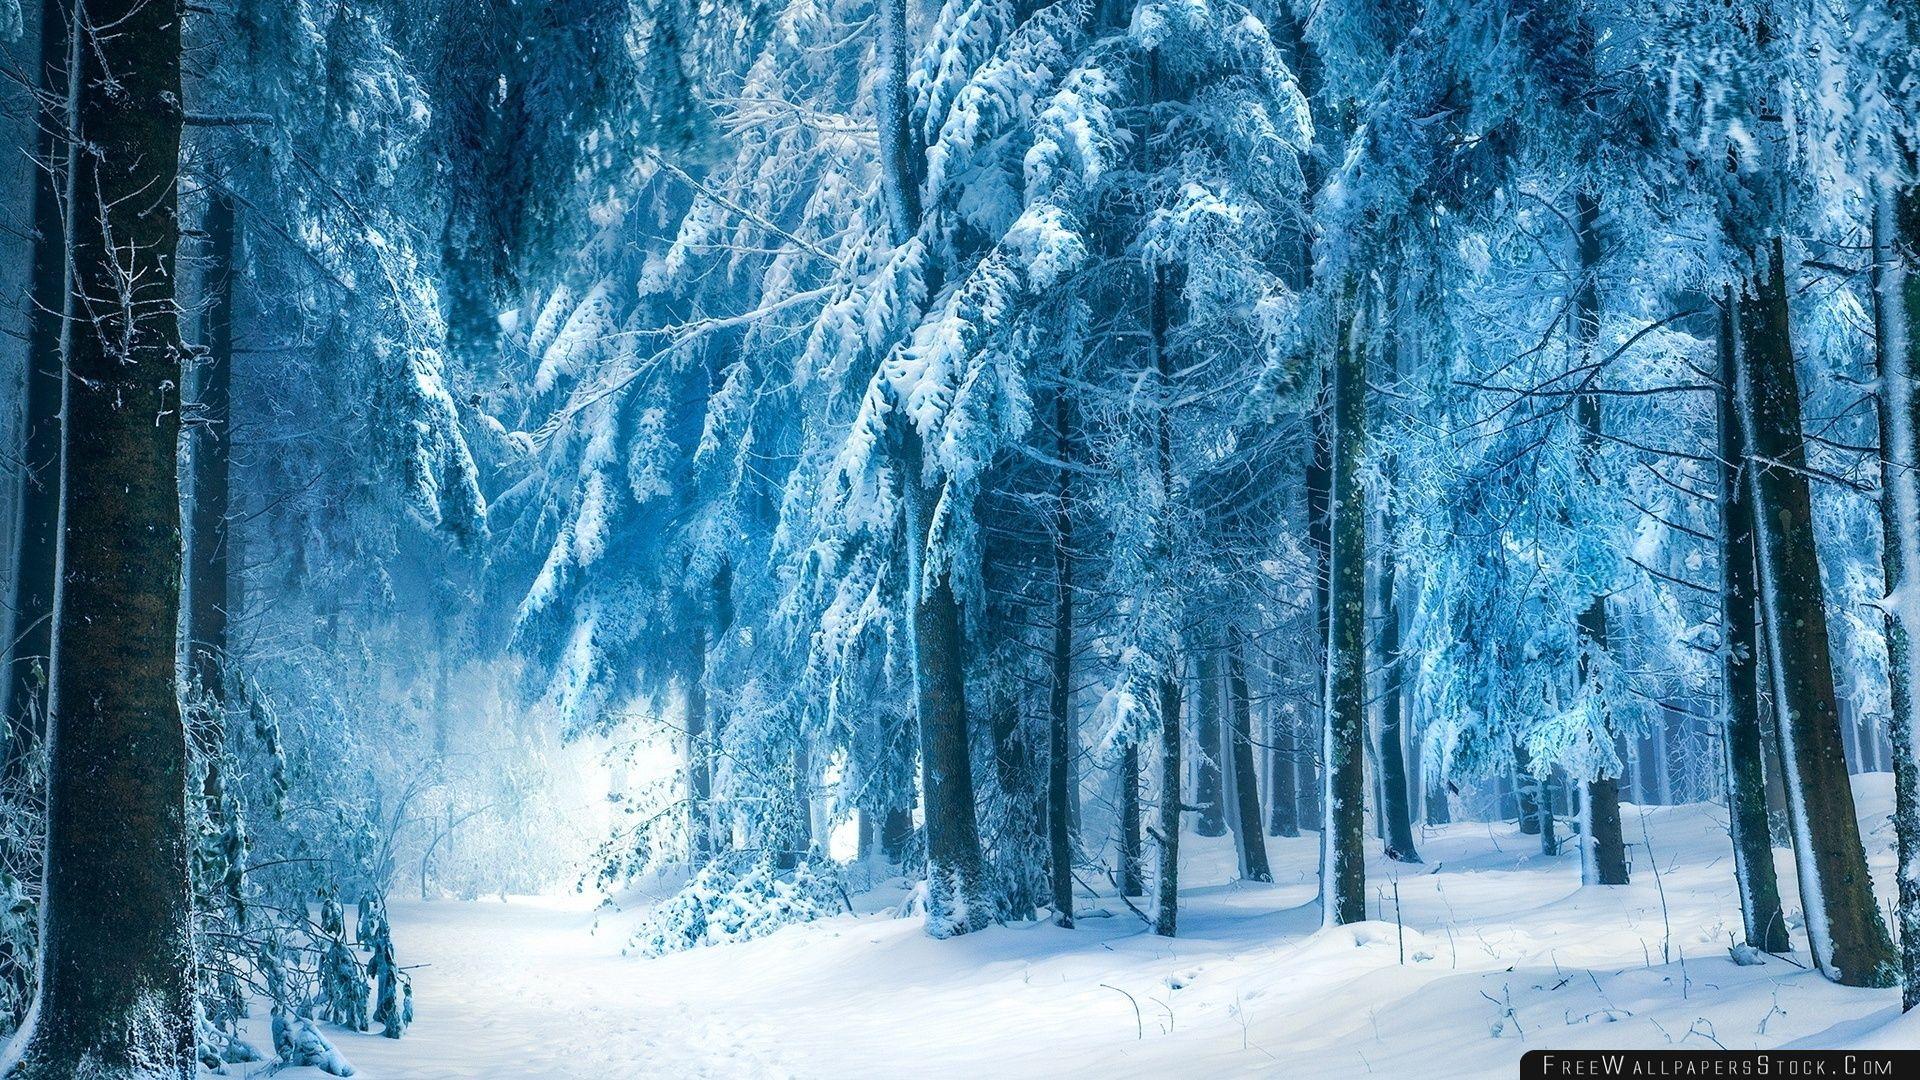 Download Free Wallpaper Under Heavy Snow